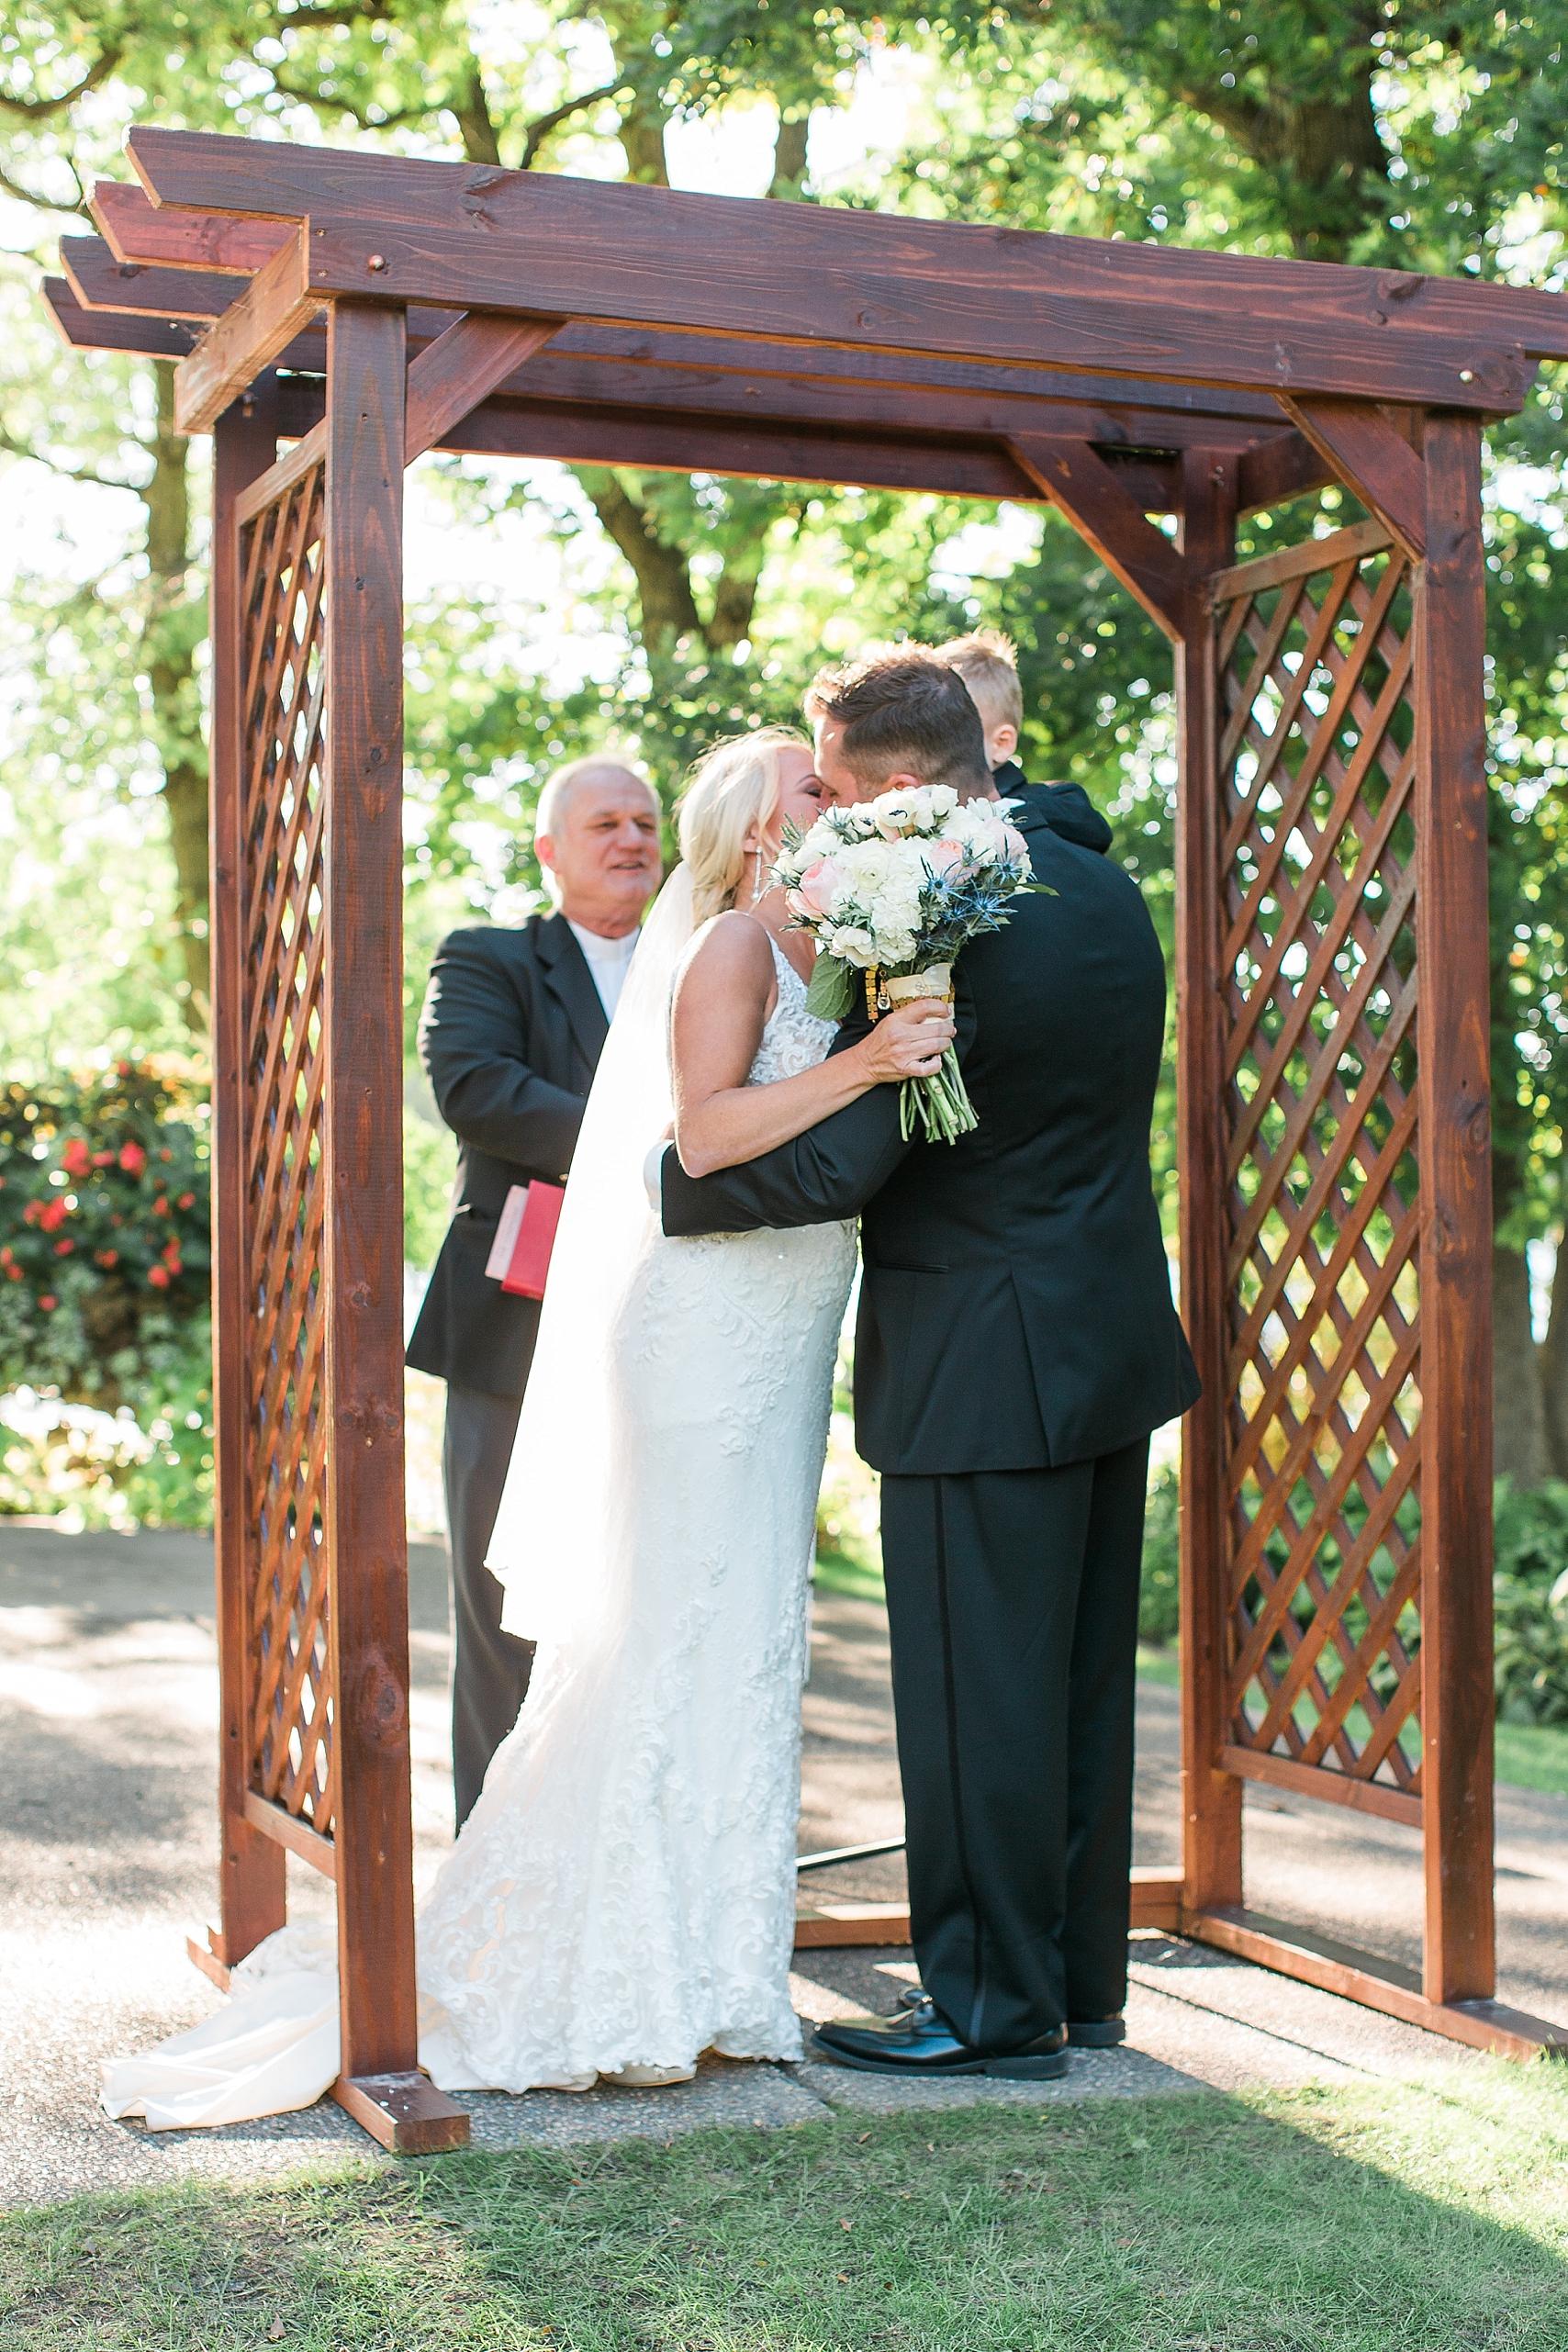 Outdoor wedding ceremony kiss at the Chart House Summer Wedding Lakeville Minnesota Minneapolis Wedding Photographer Mallory Kiesow